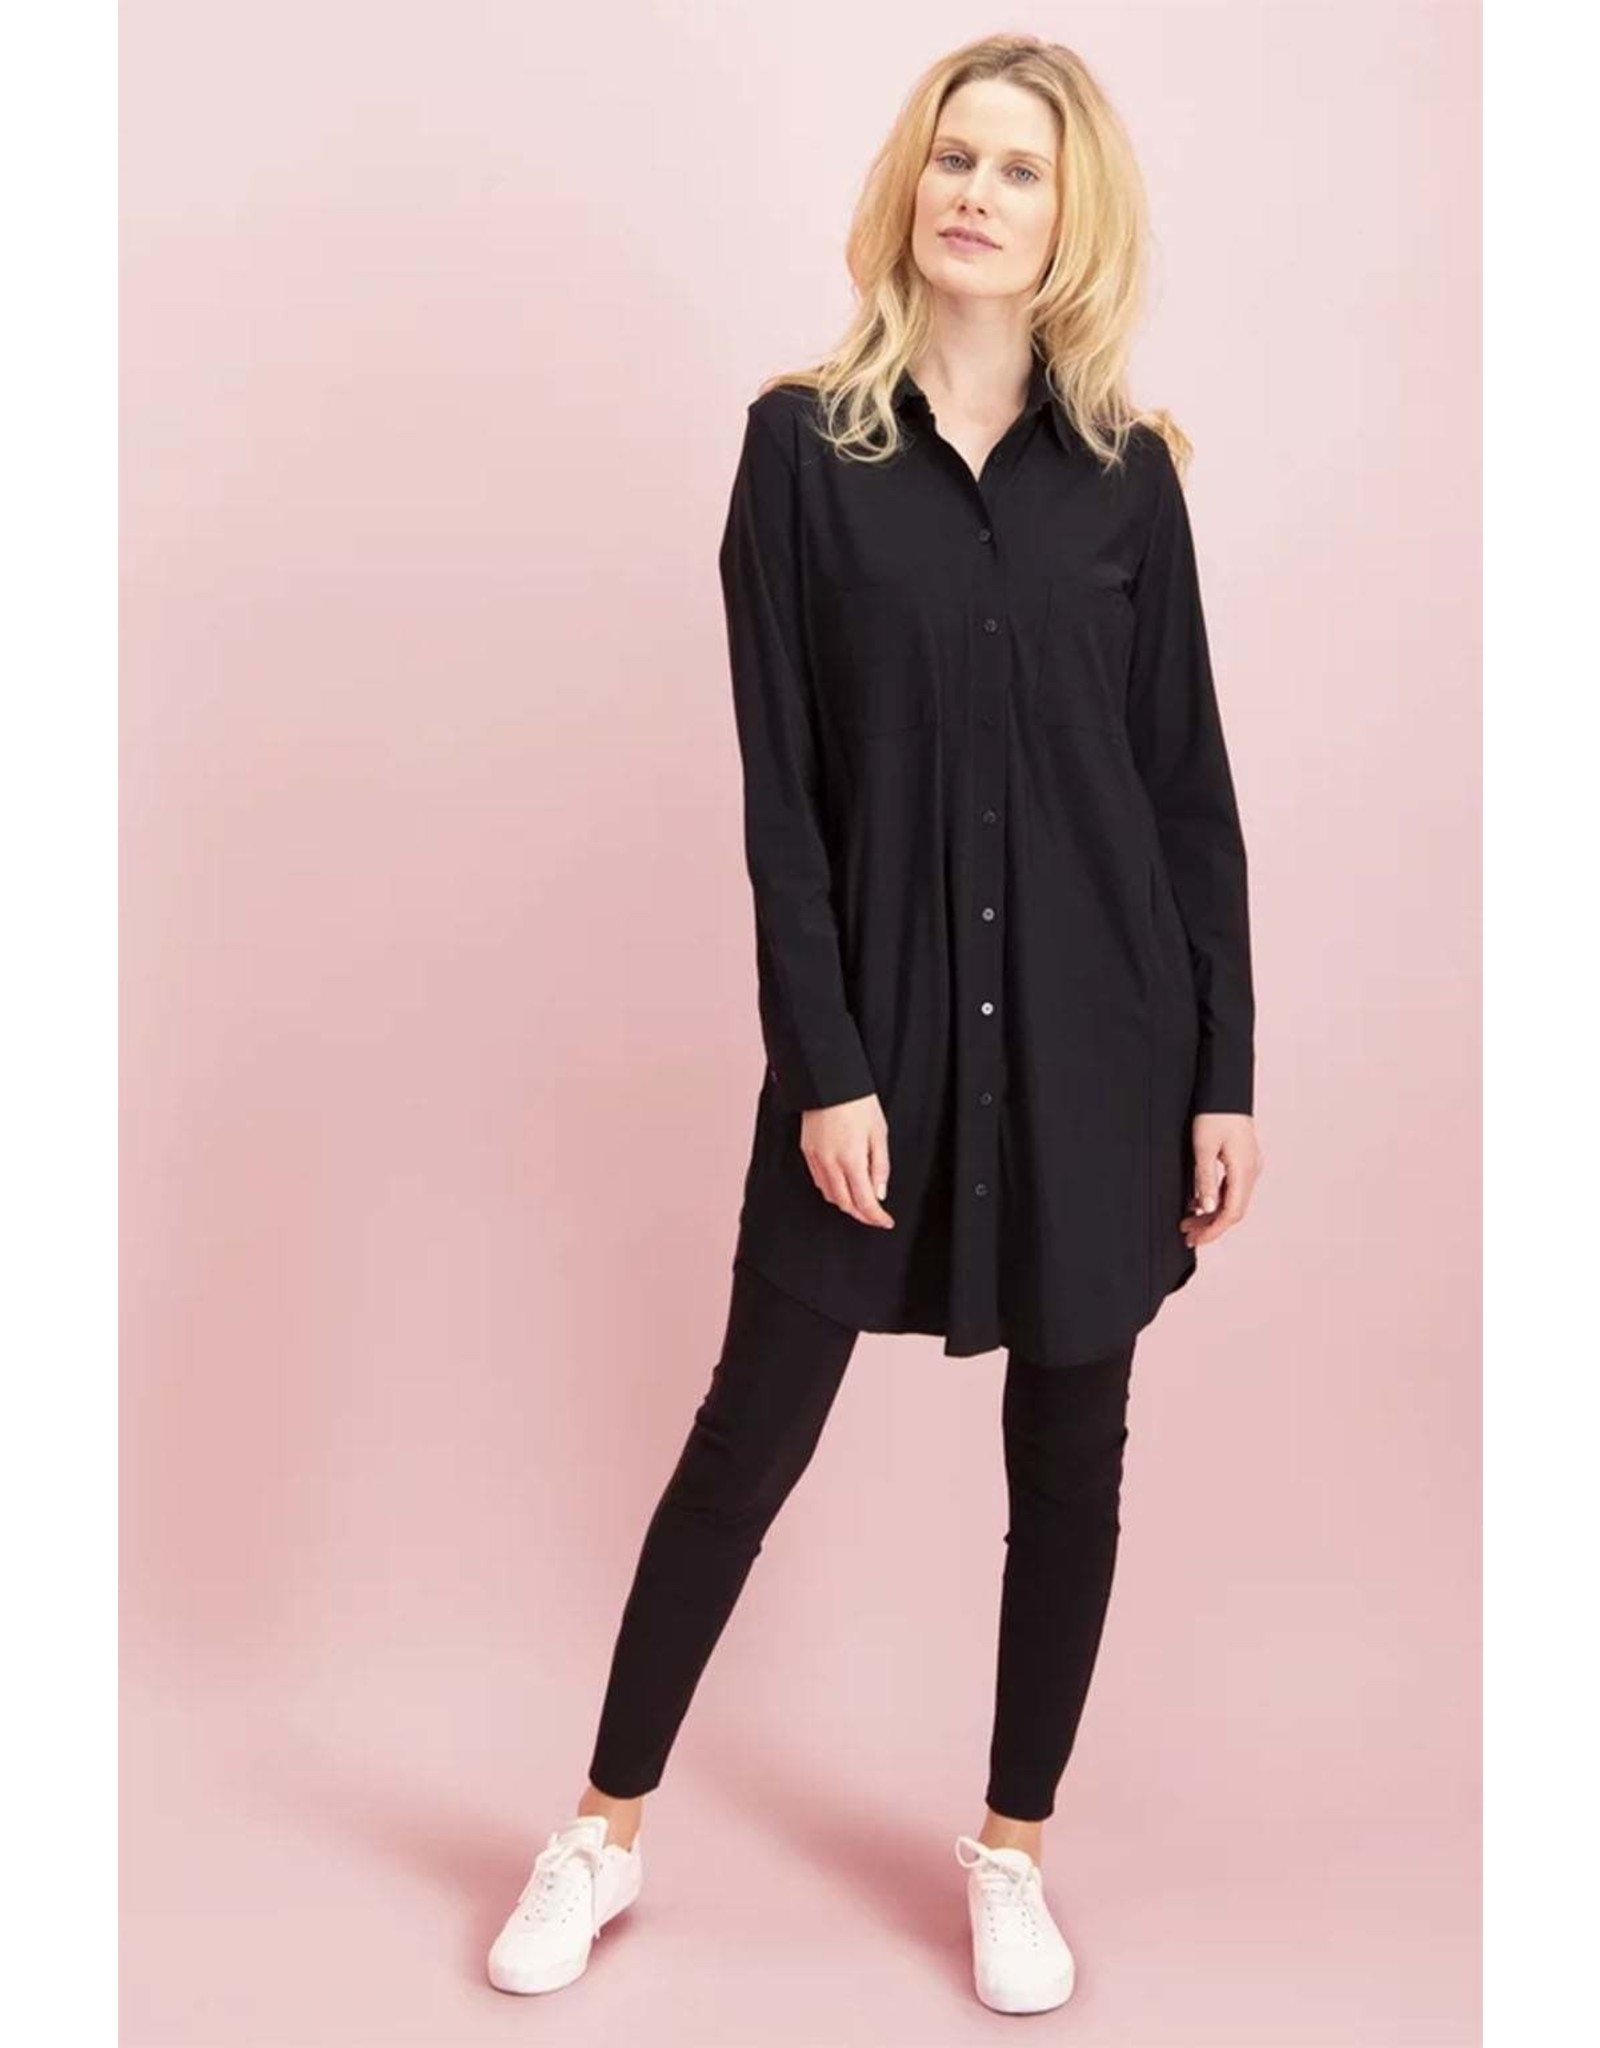 Studio Anneloes goldie 10 blouse 91874